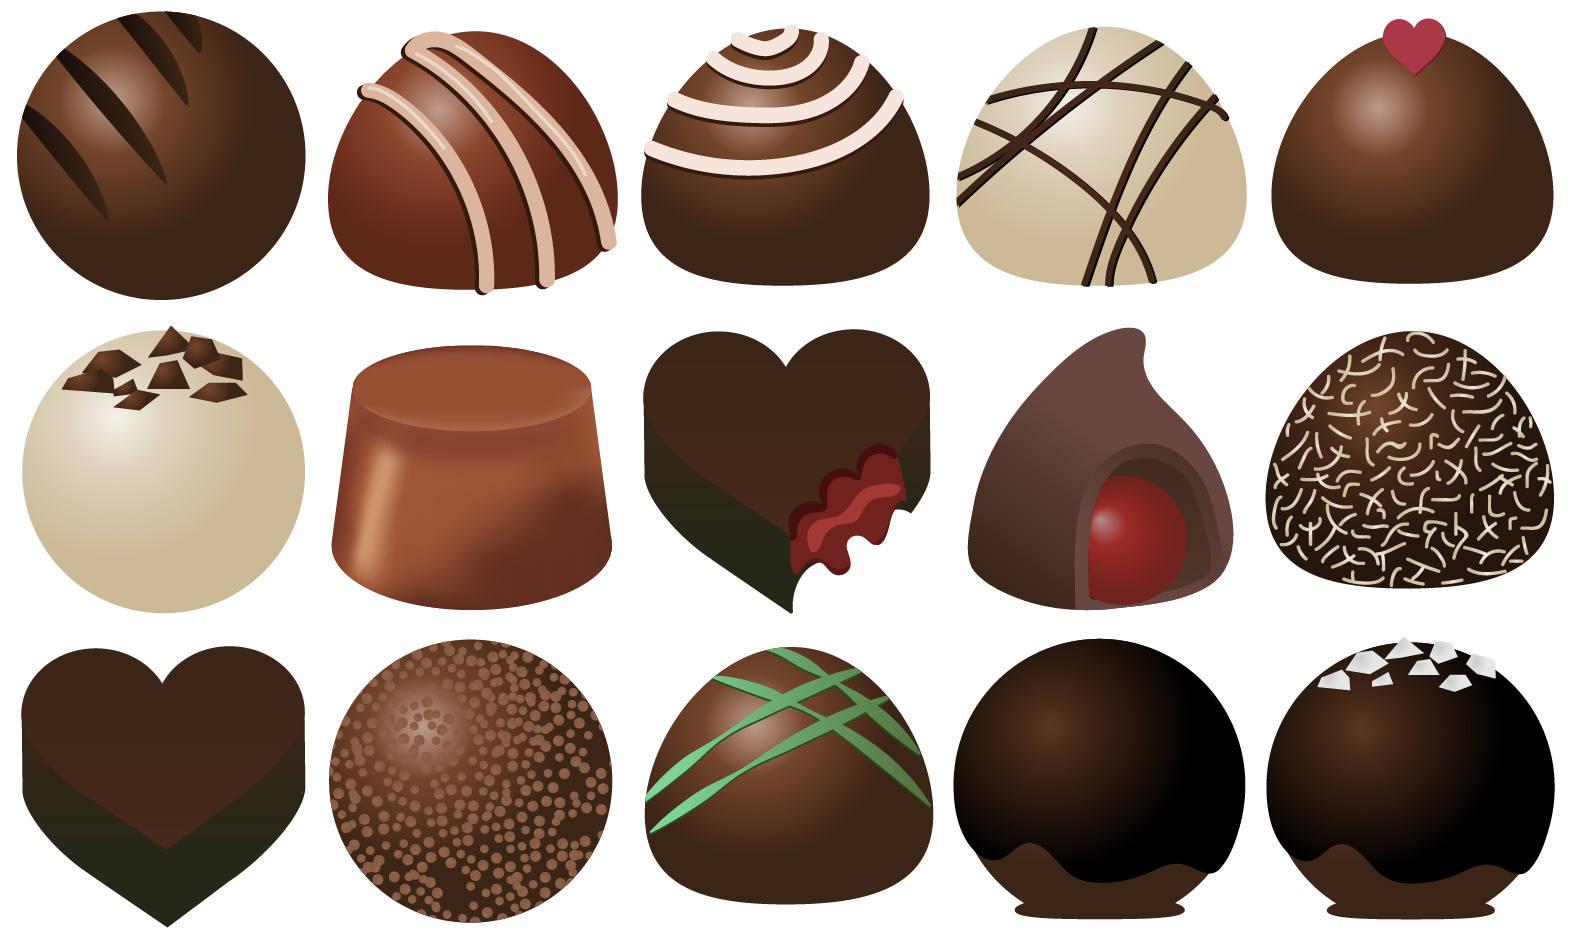 Truffles candy clip art. Chocolate clipart chocolate truffle